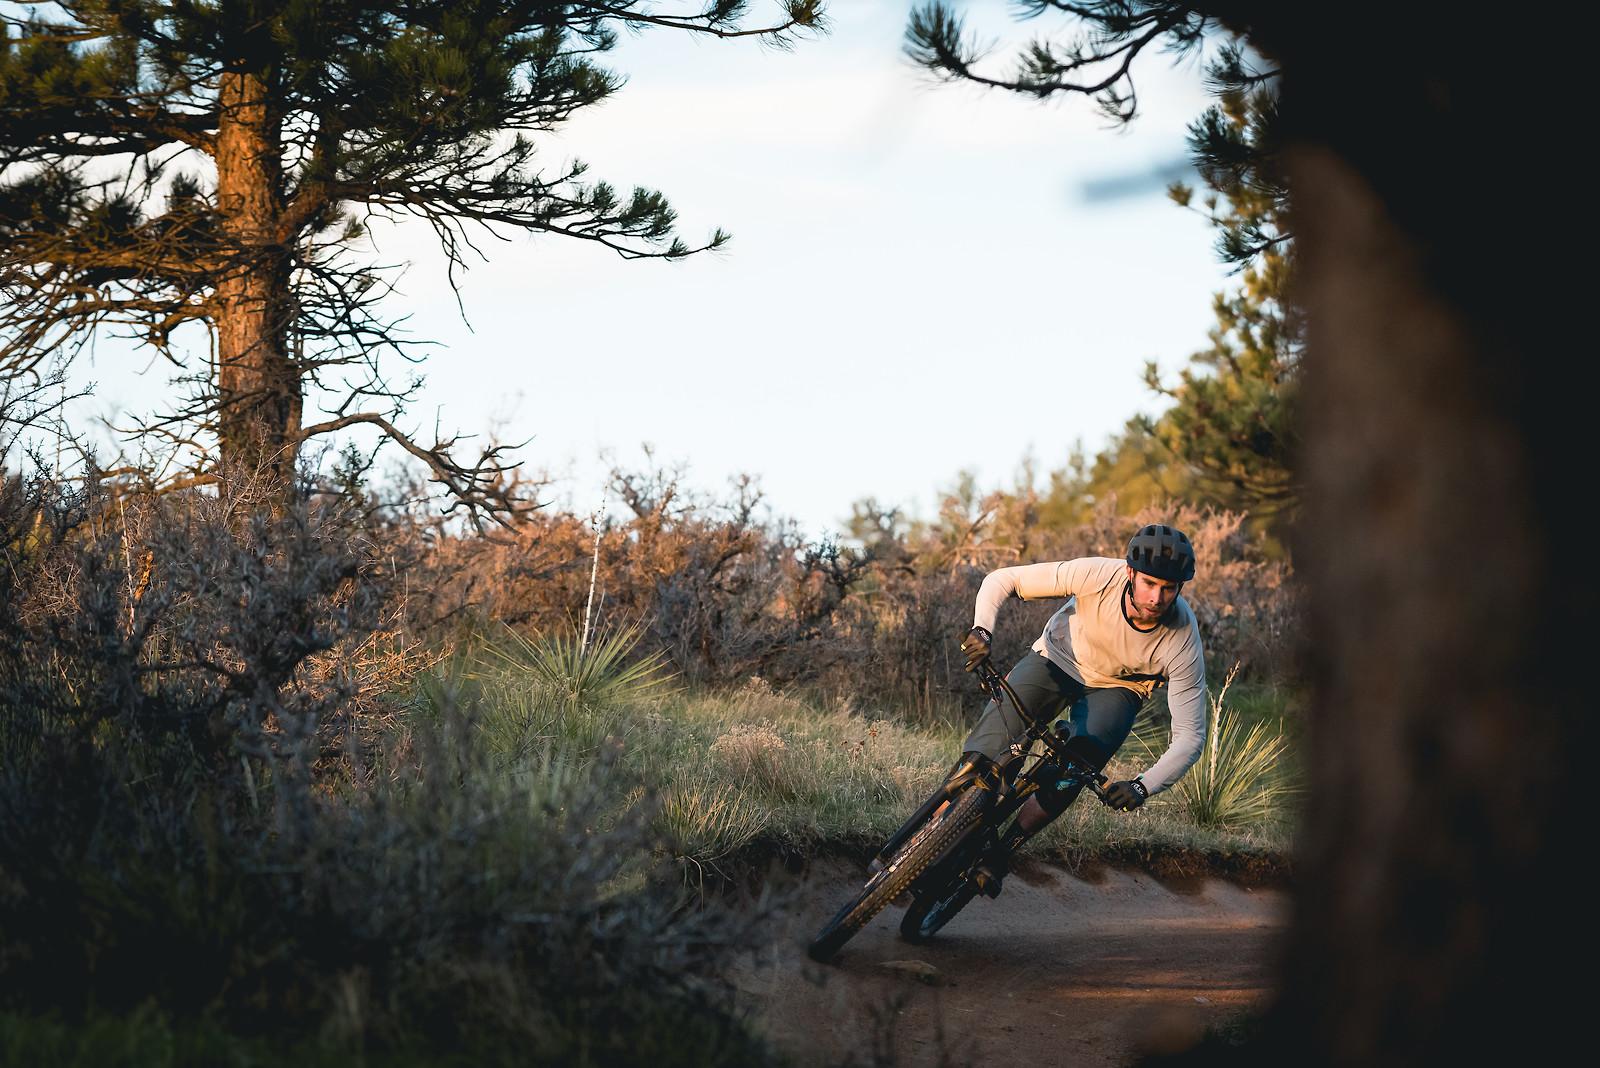 PJR 6008-1-2 - russellpj - Mountain Biking Pictures - Vital MTB